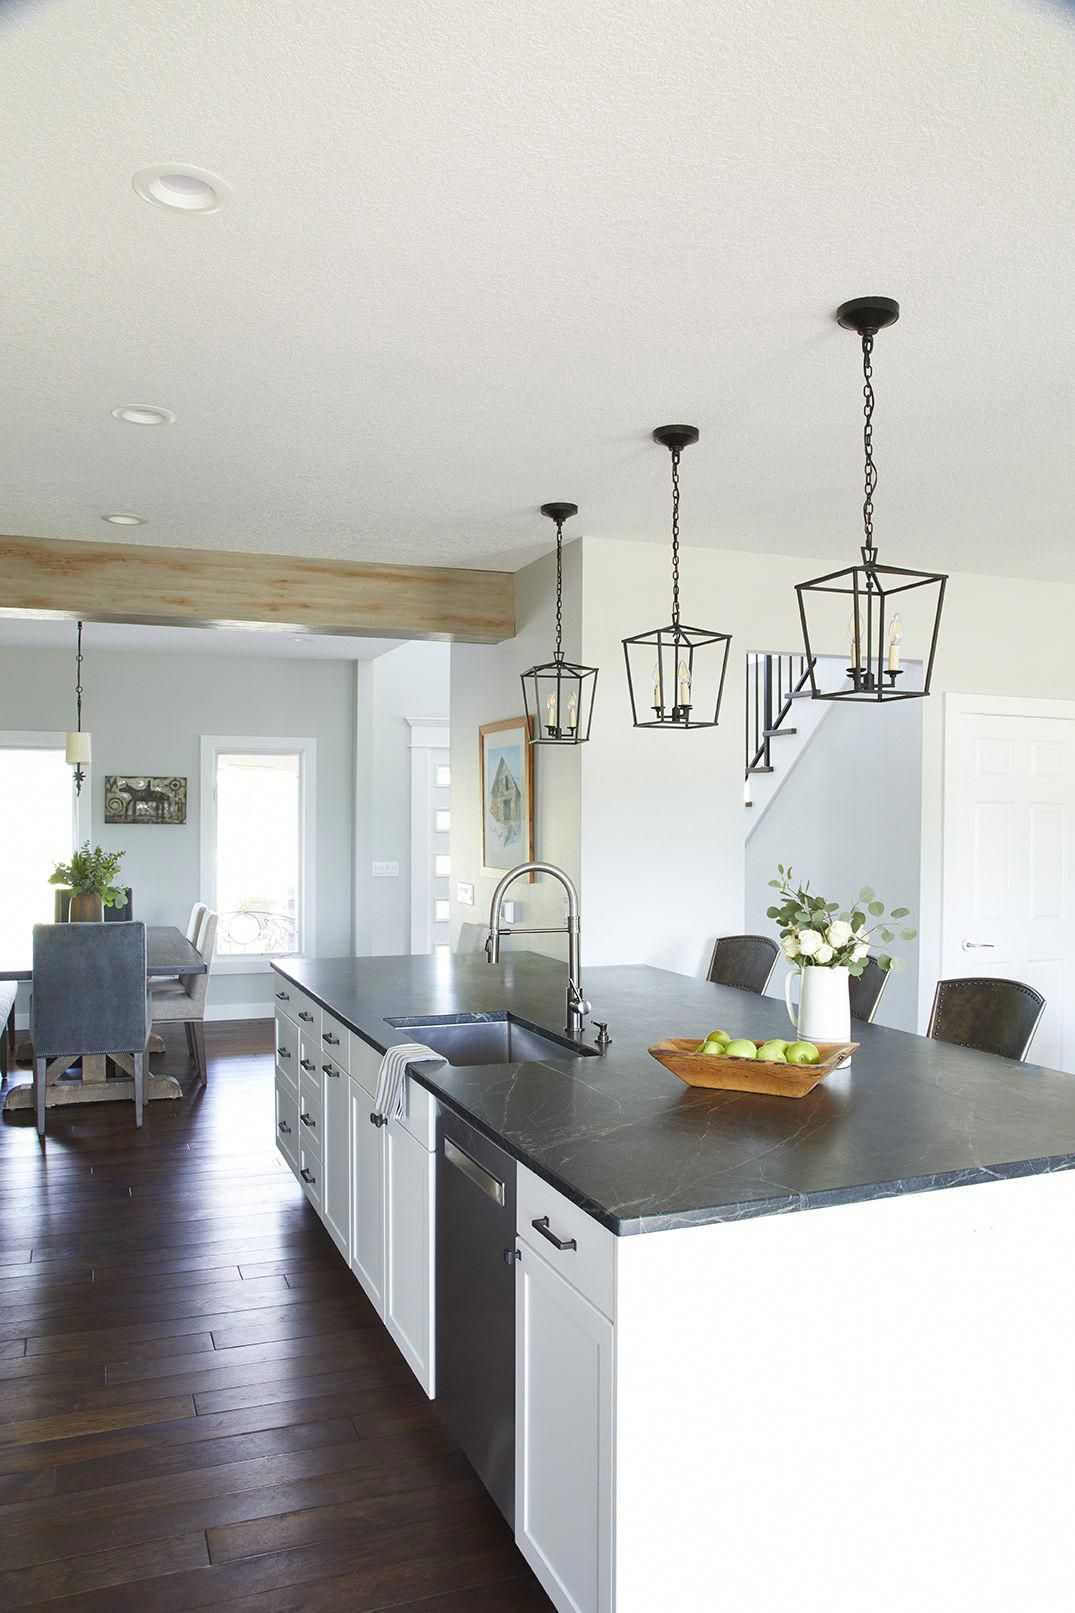 Modern Farmhouse Kitchen With White Cabinets And Soapstone Countertops By Jillia Kitchen Projects Design Replacing Kitchen Countertops Farmhouse Kitchen Design